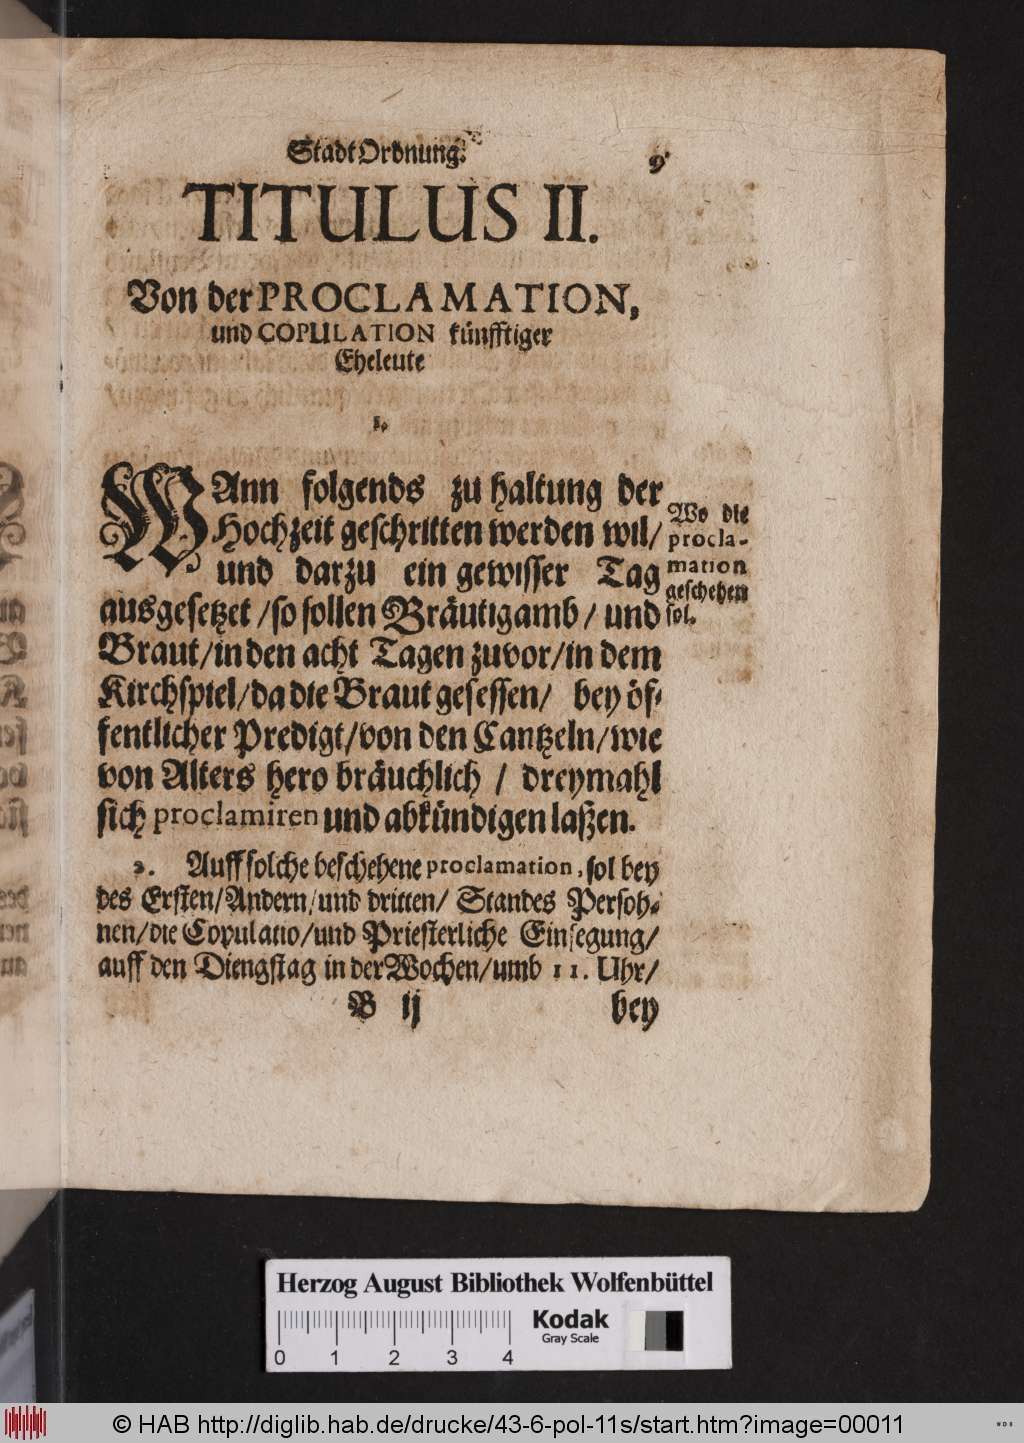 http://diglib.hab.de/drucke/43-6-pol-11s/00011.jpg